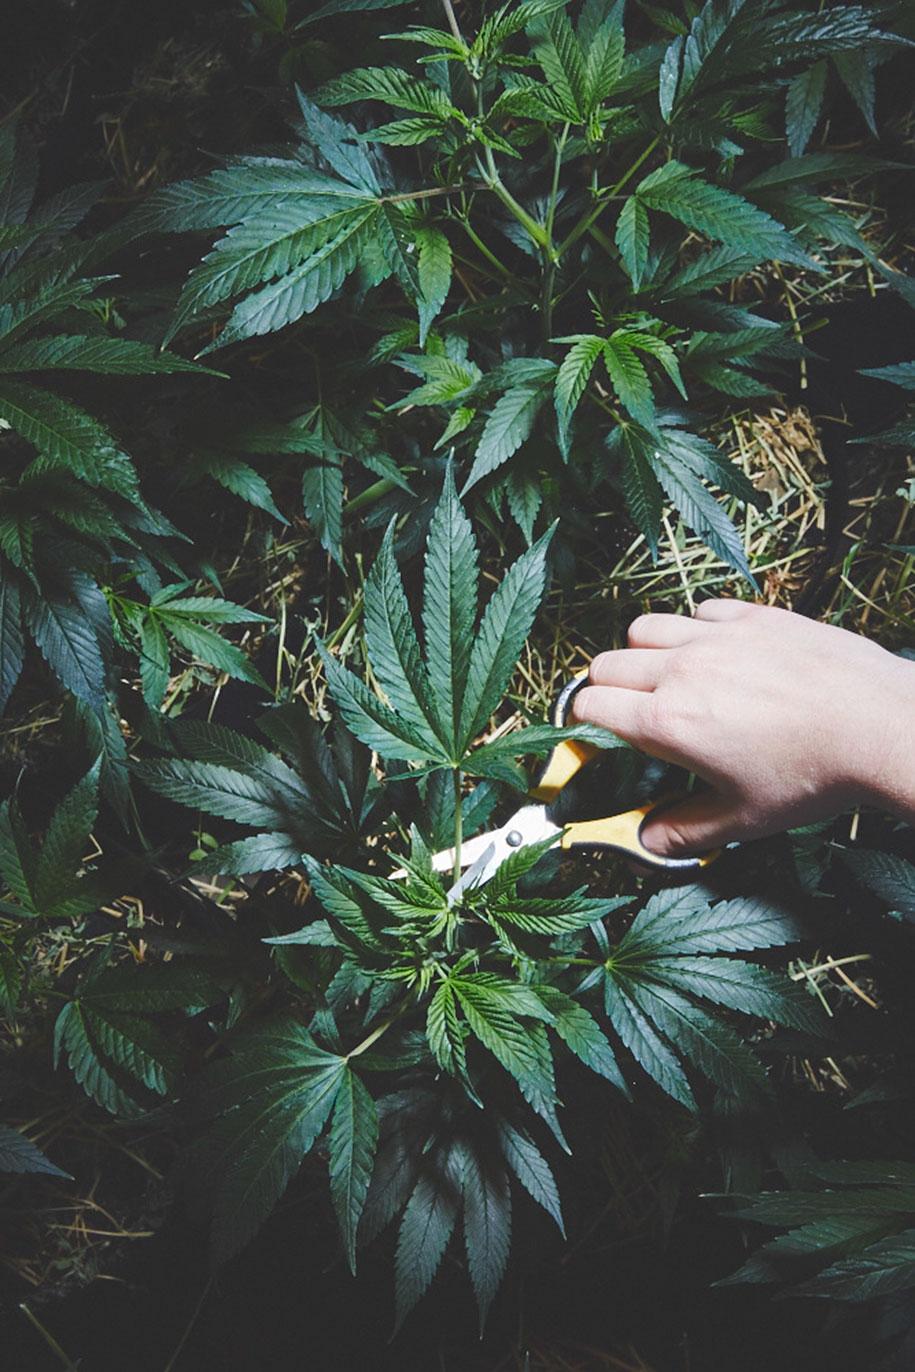 marijuana-horticulture-sisters-of-the-valley-shaughn-crawford-john-dubois-21